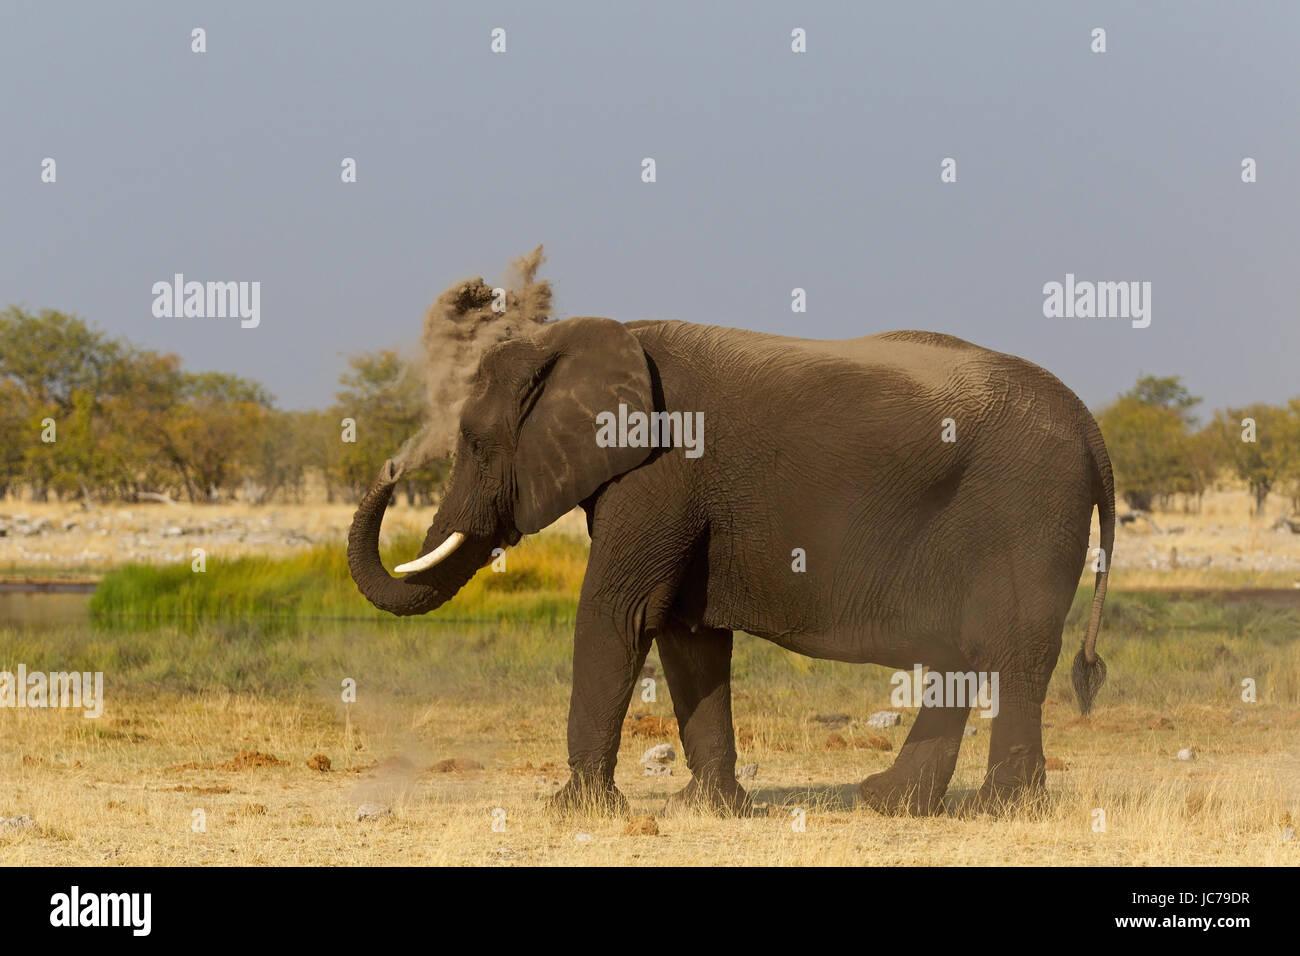 African Bush Elephant, African Savanna Elephant - Stock Image